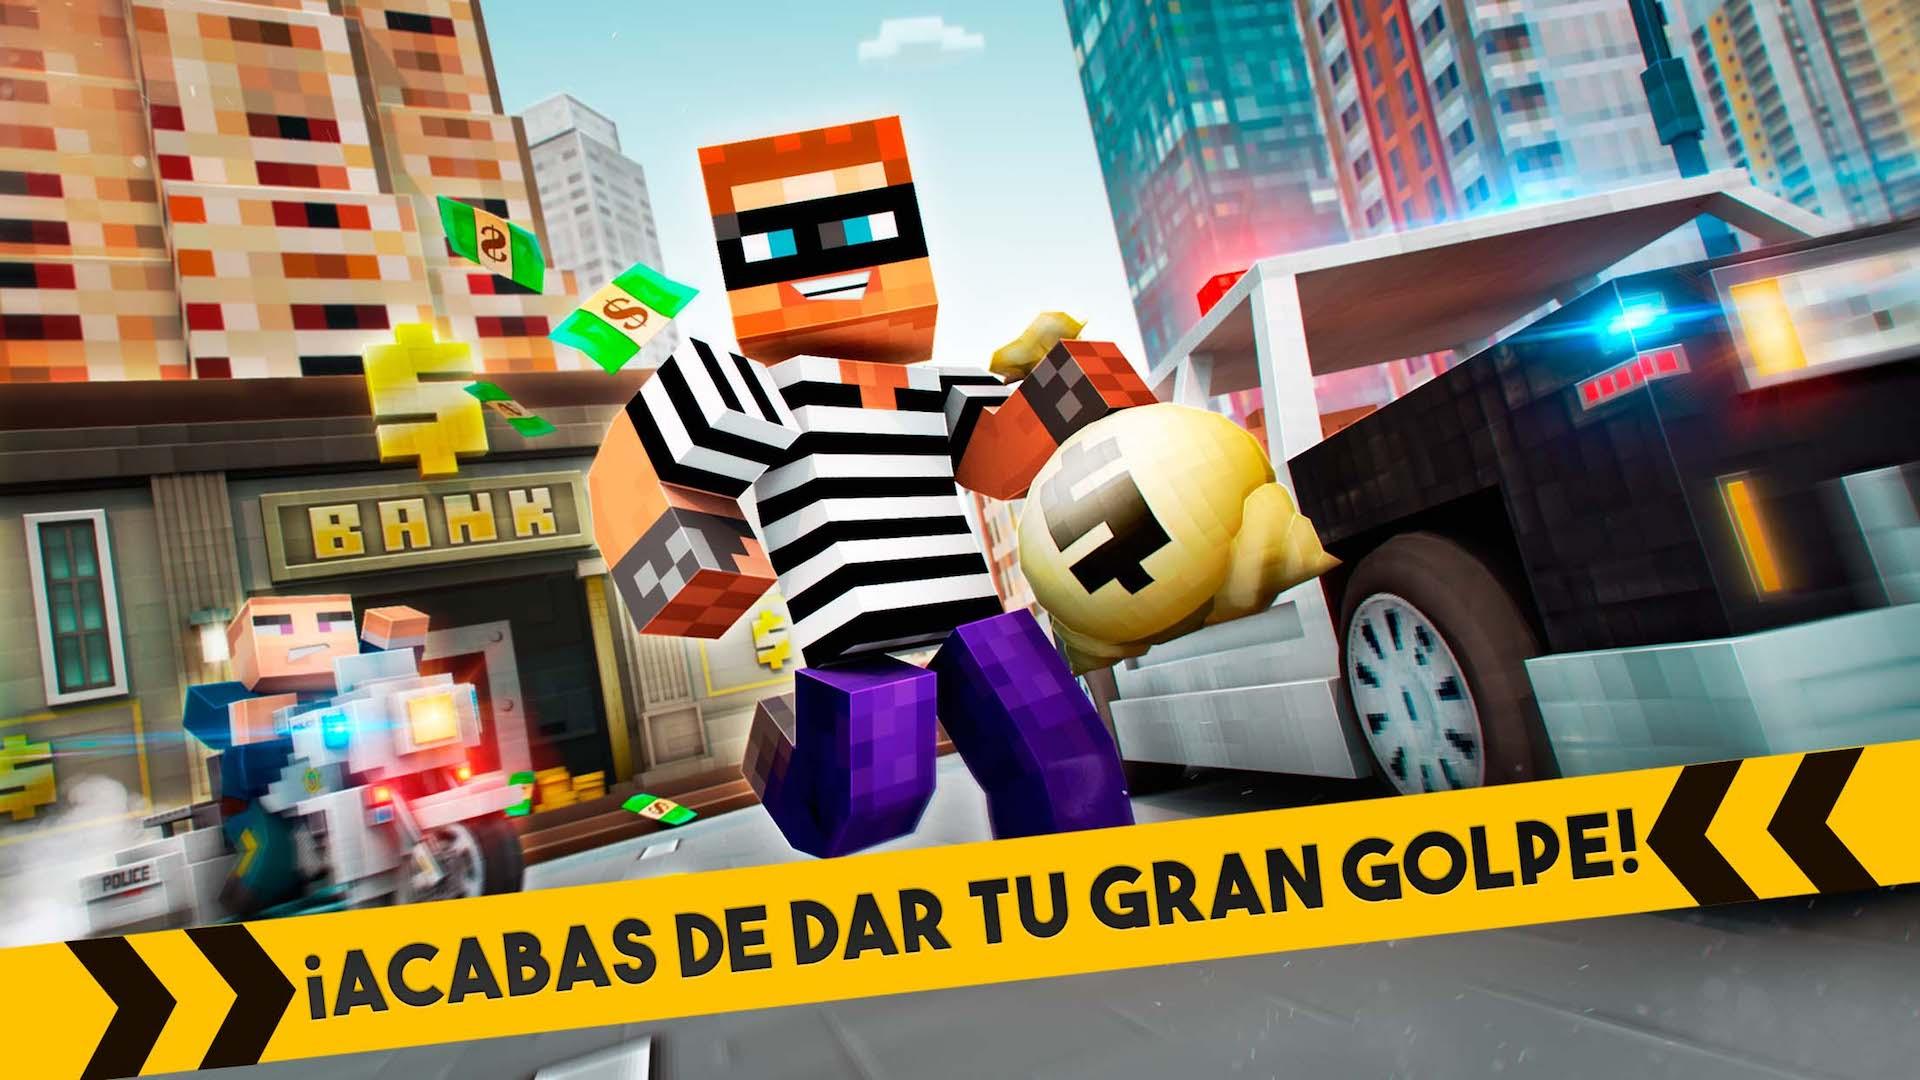 Robber Race Escape - Juego Infinito de Carreras de Coches con Policías